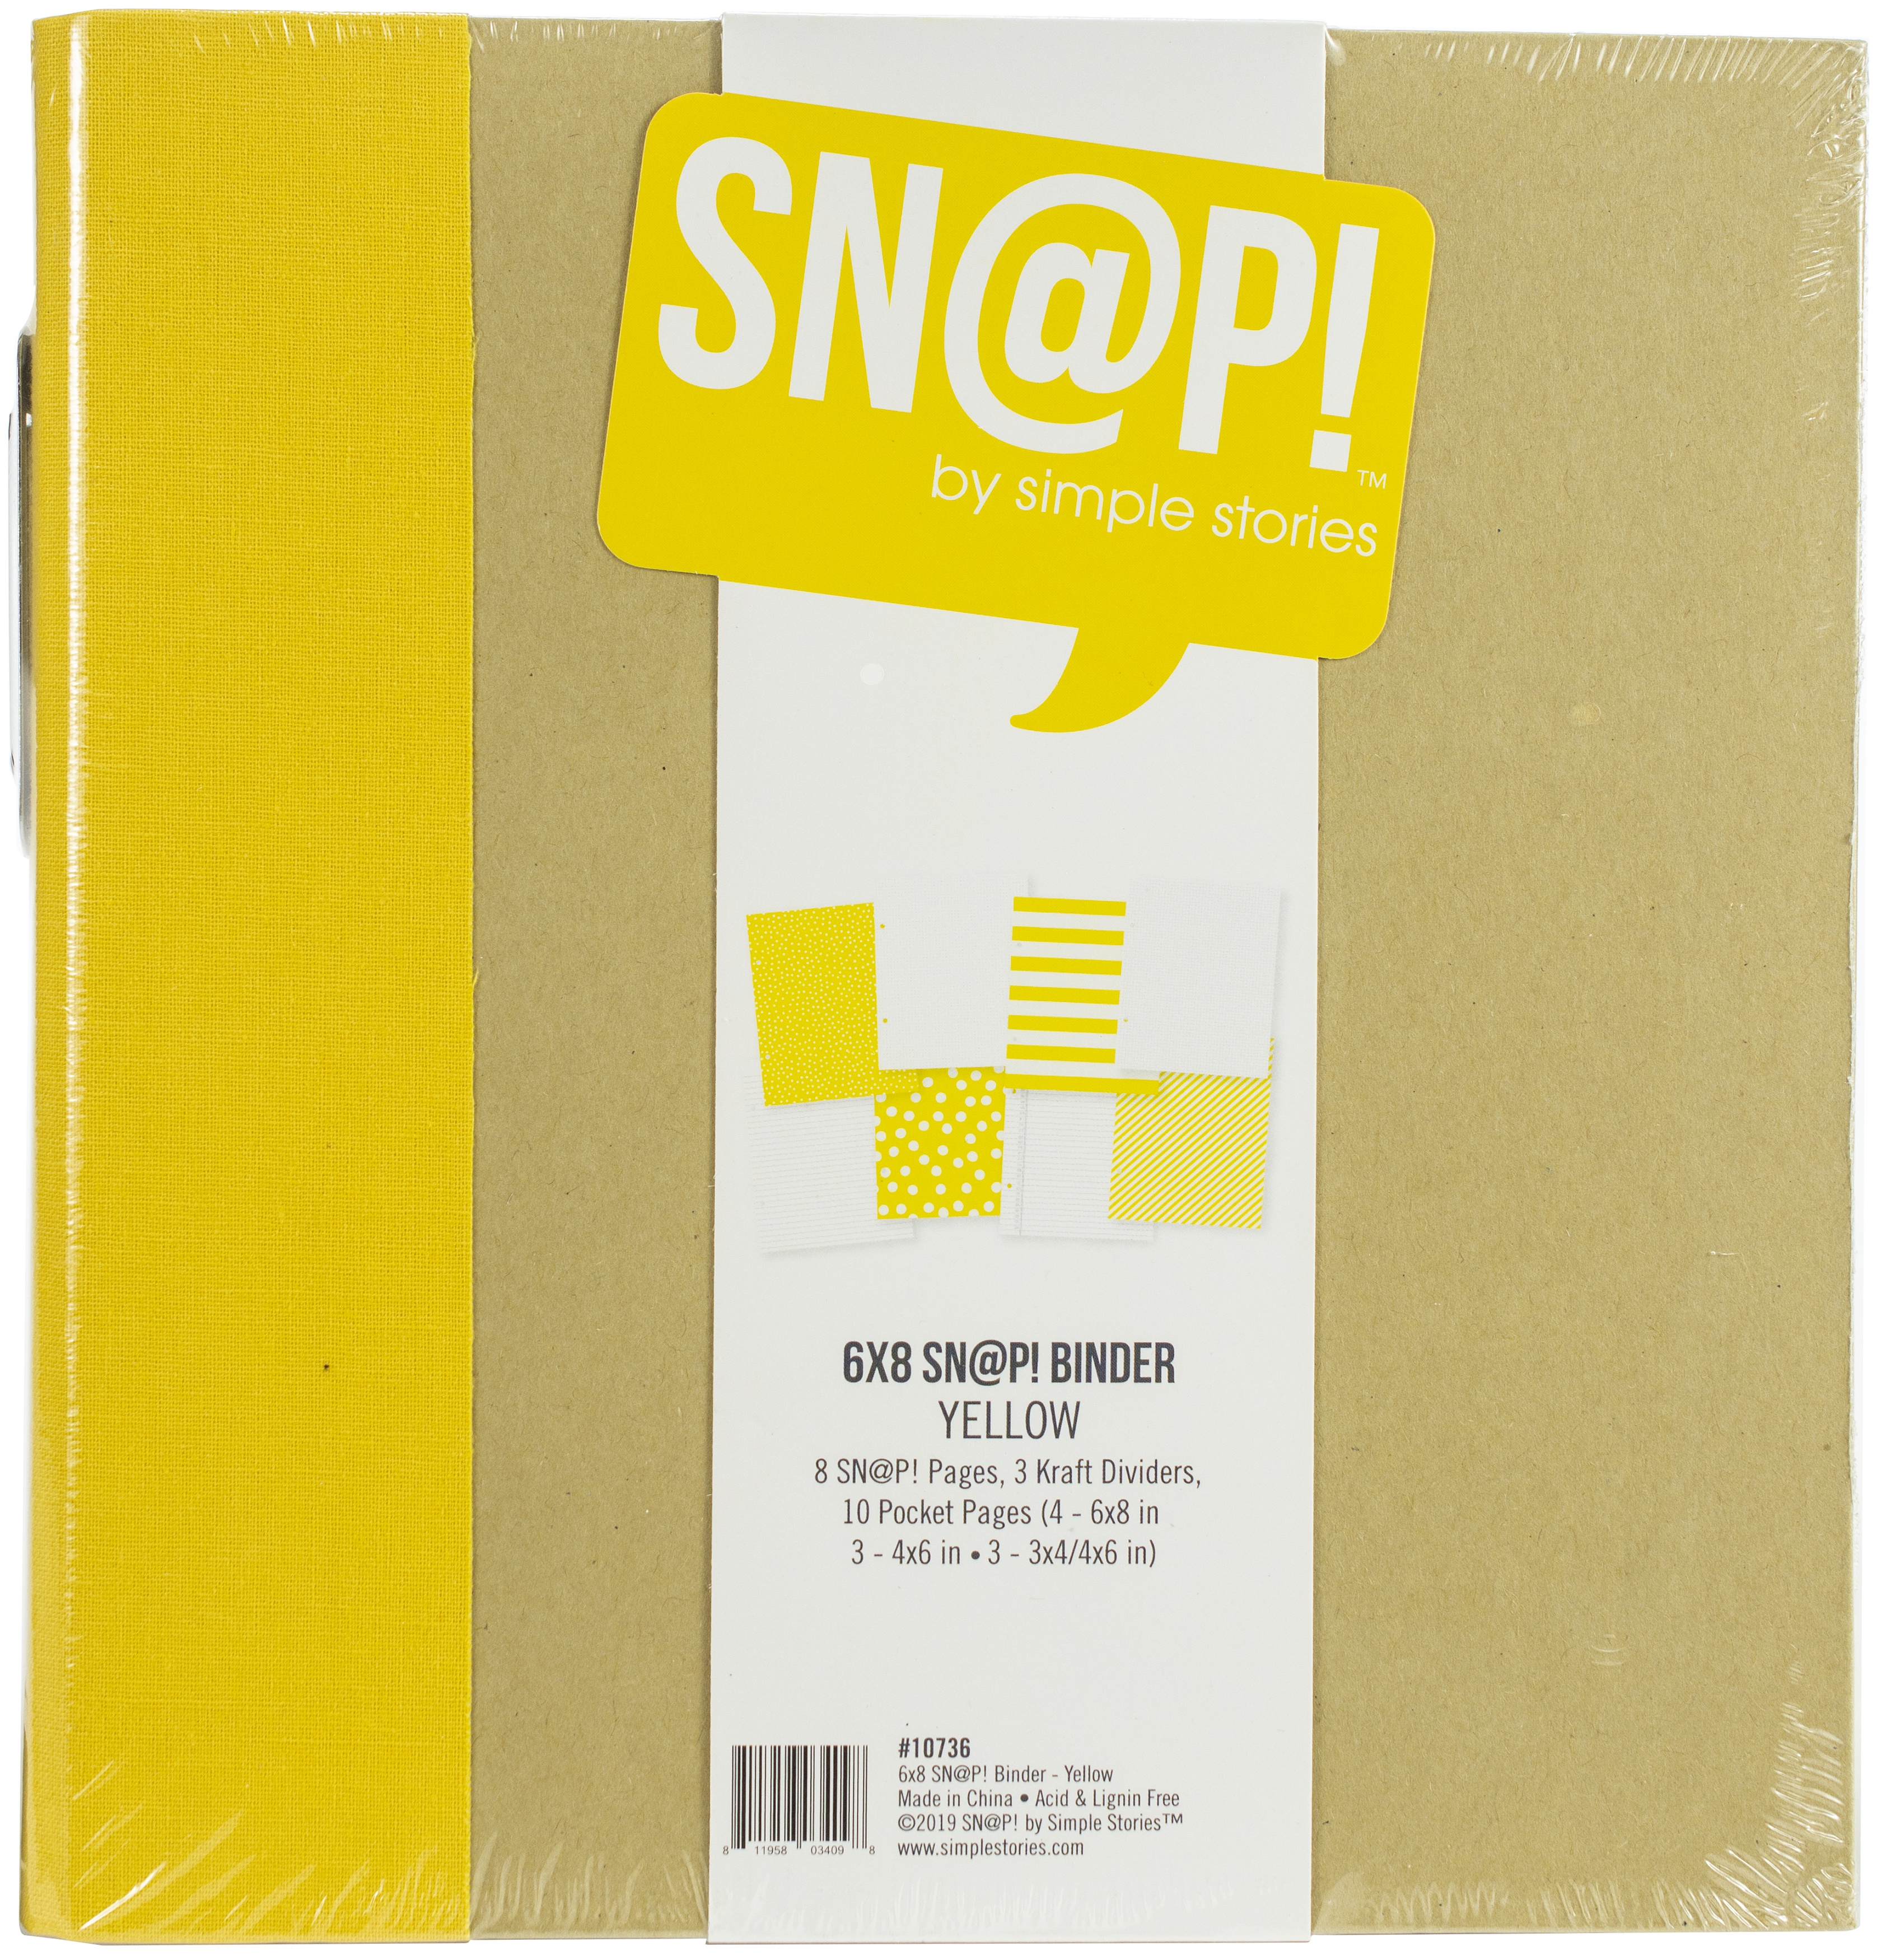 Simple Stories Sn@p! Binder 6X8-Yellow